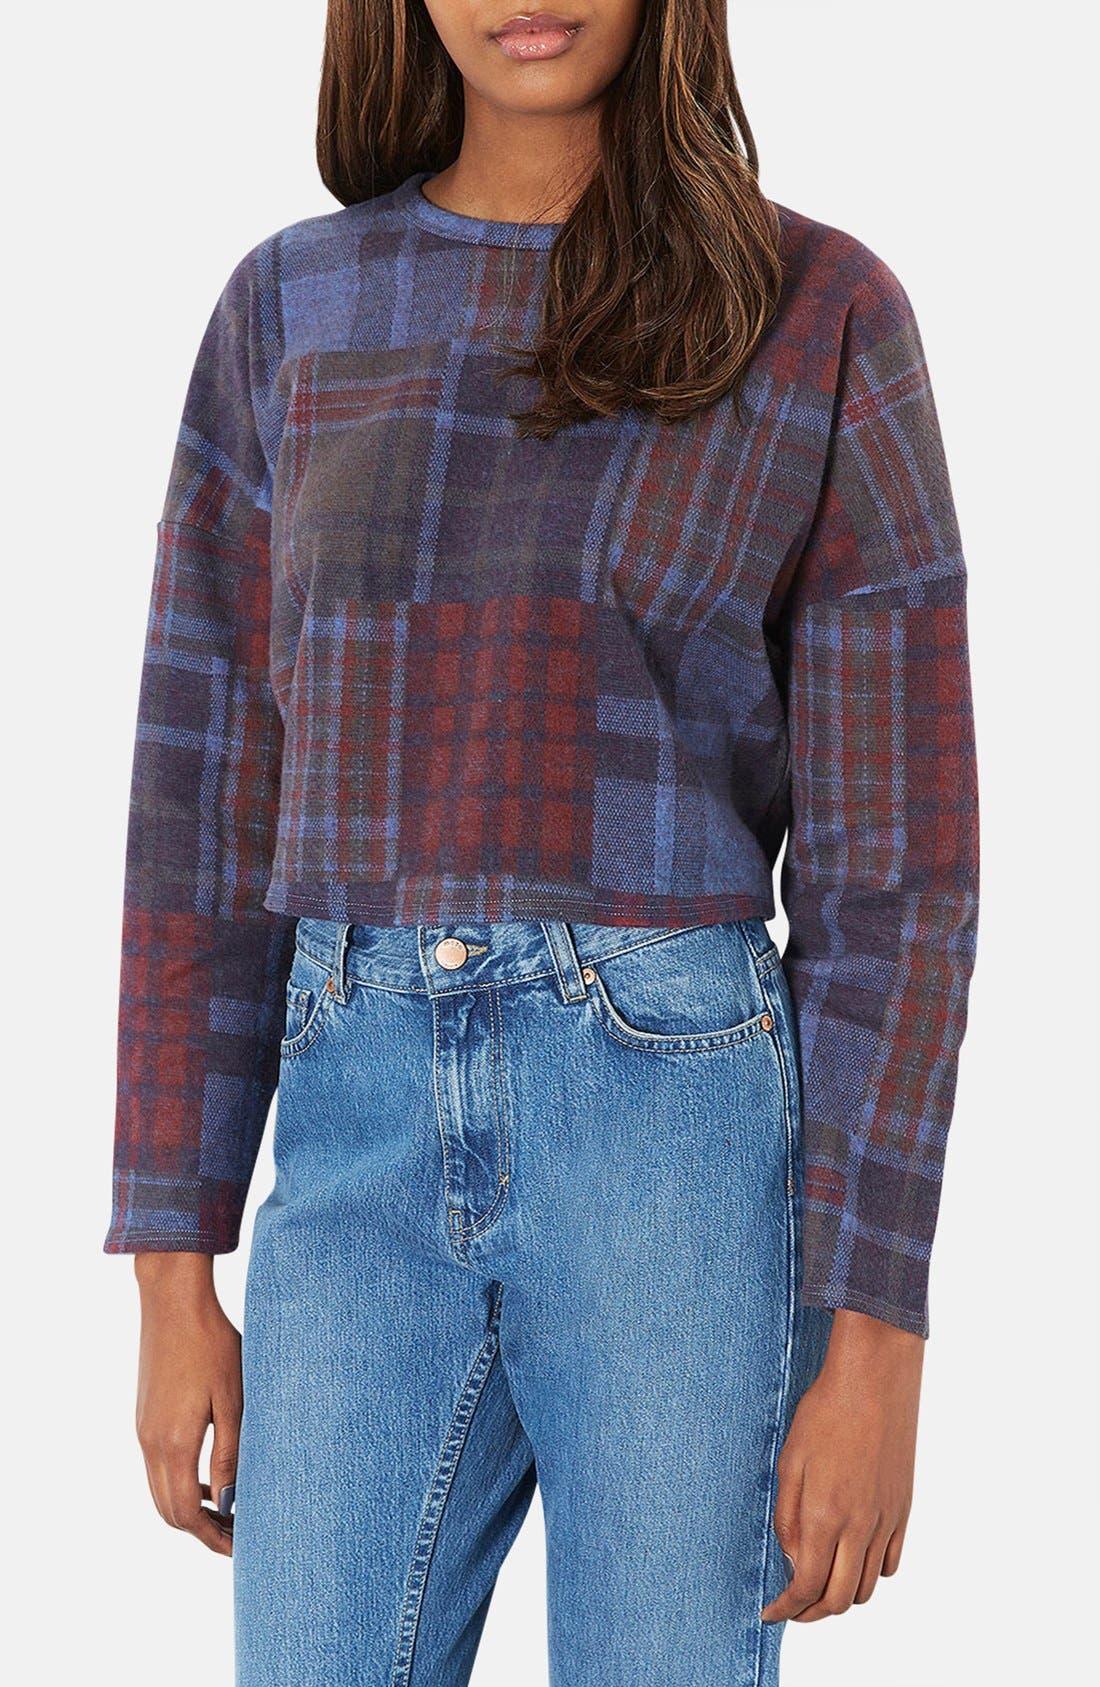 Alternate Image 1 Selected - Topshop Mixed Plaid Crop Sweater (Petite)